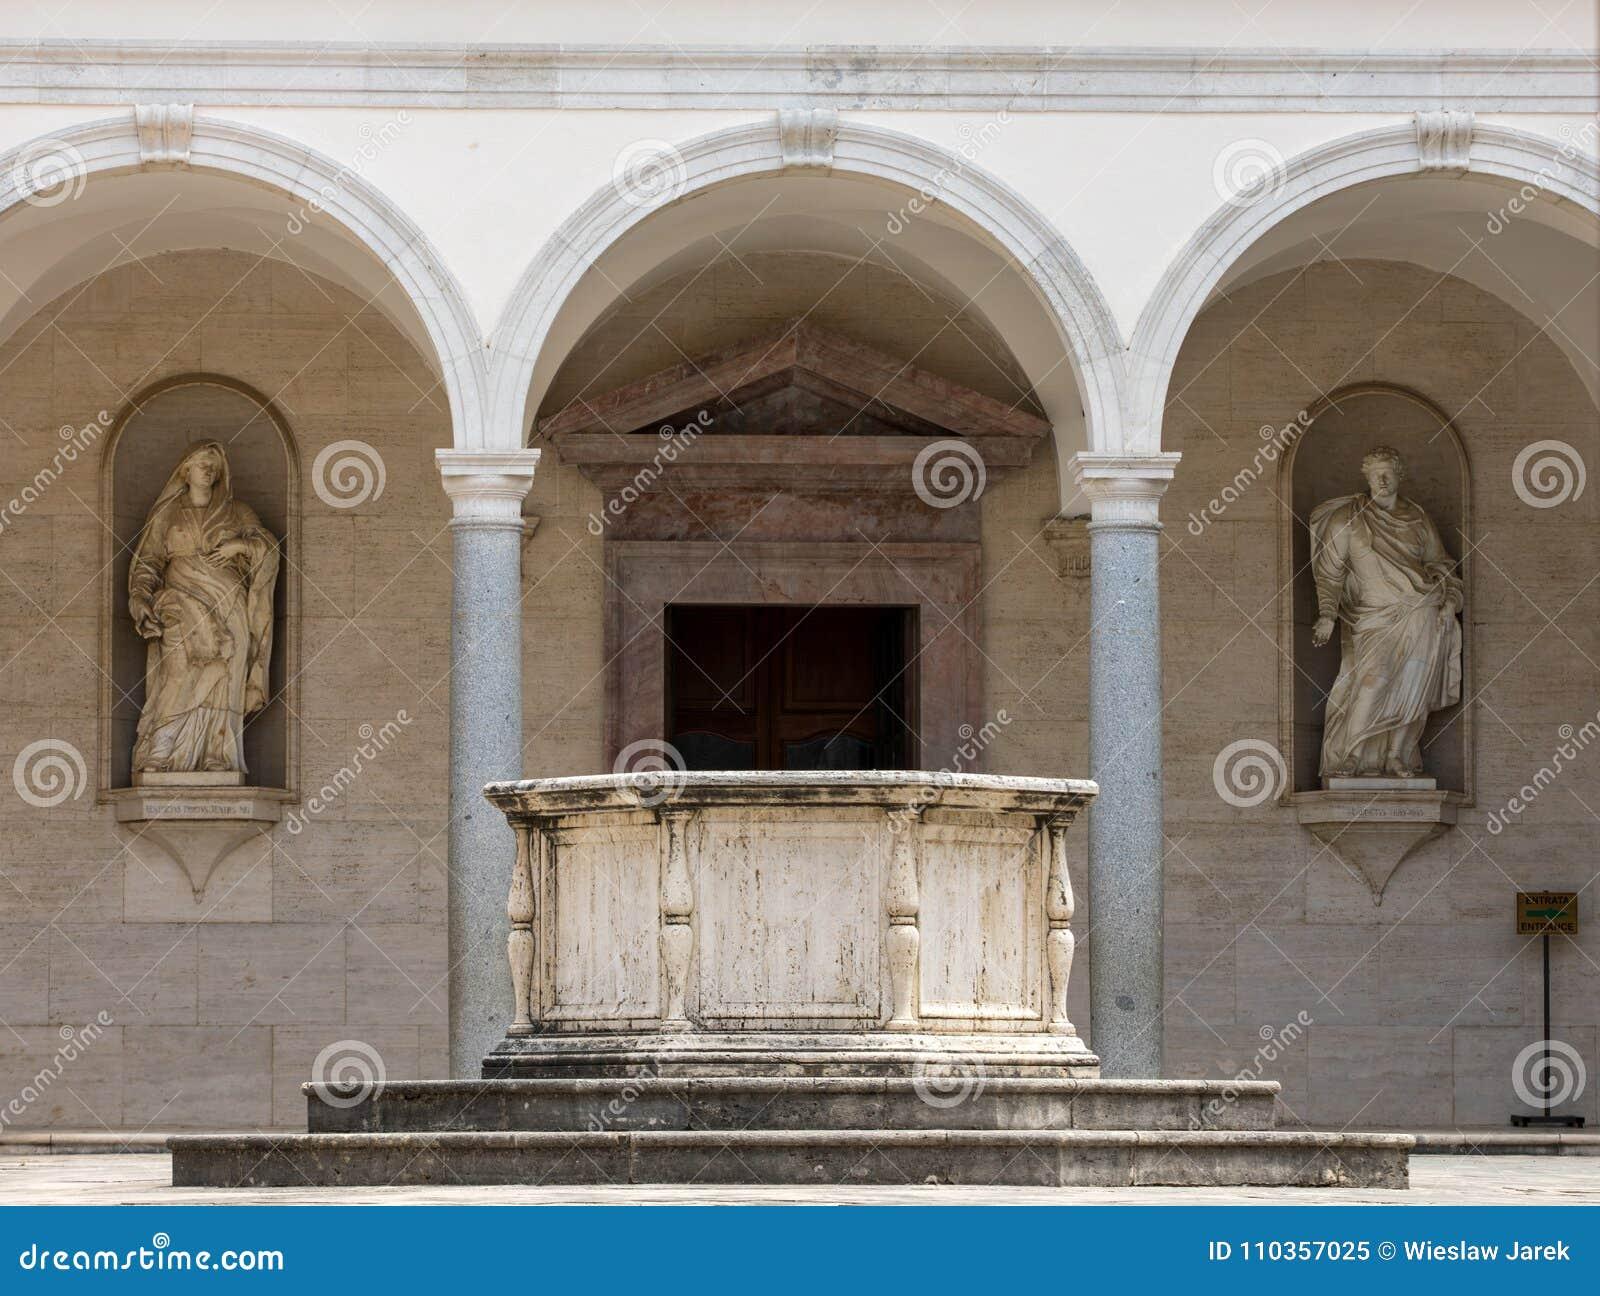 Монастырь бенедиктинского аббатства Monte Cassino Италия